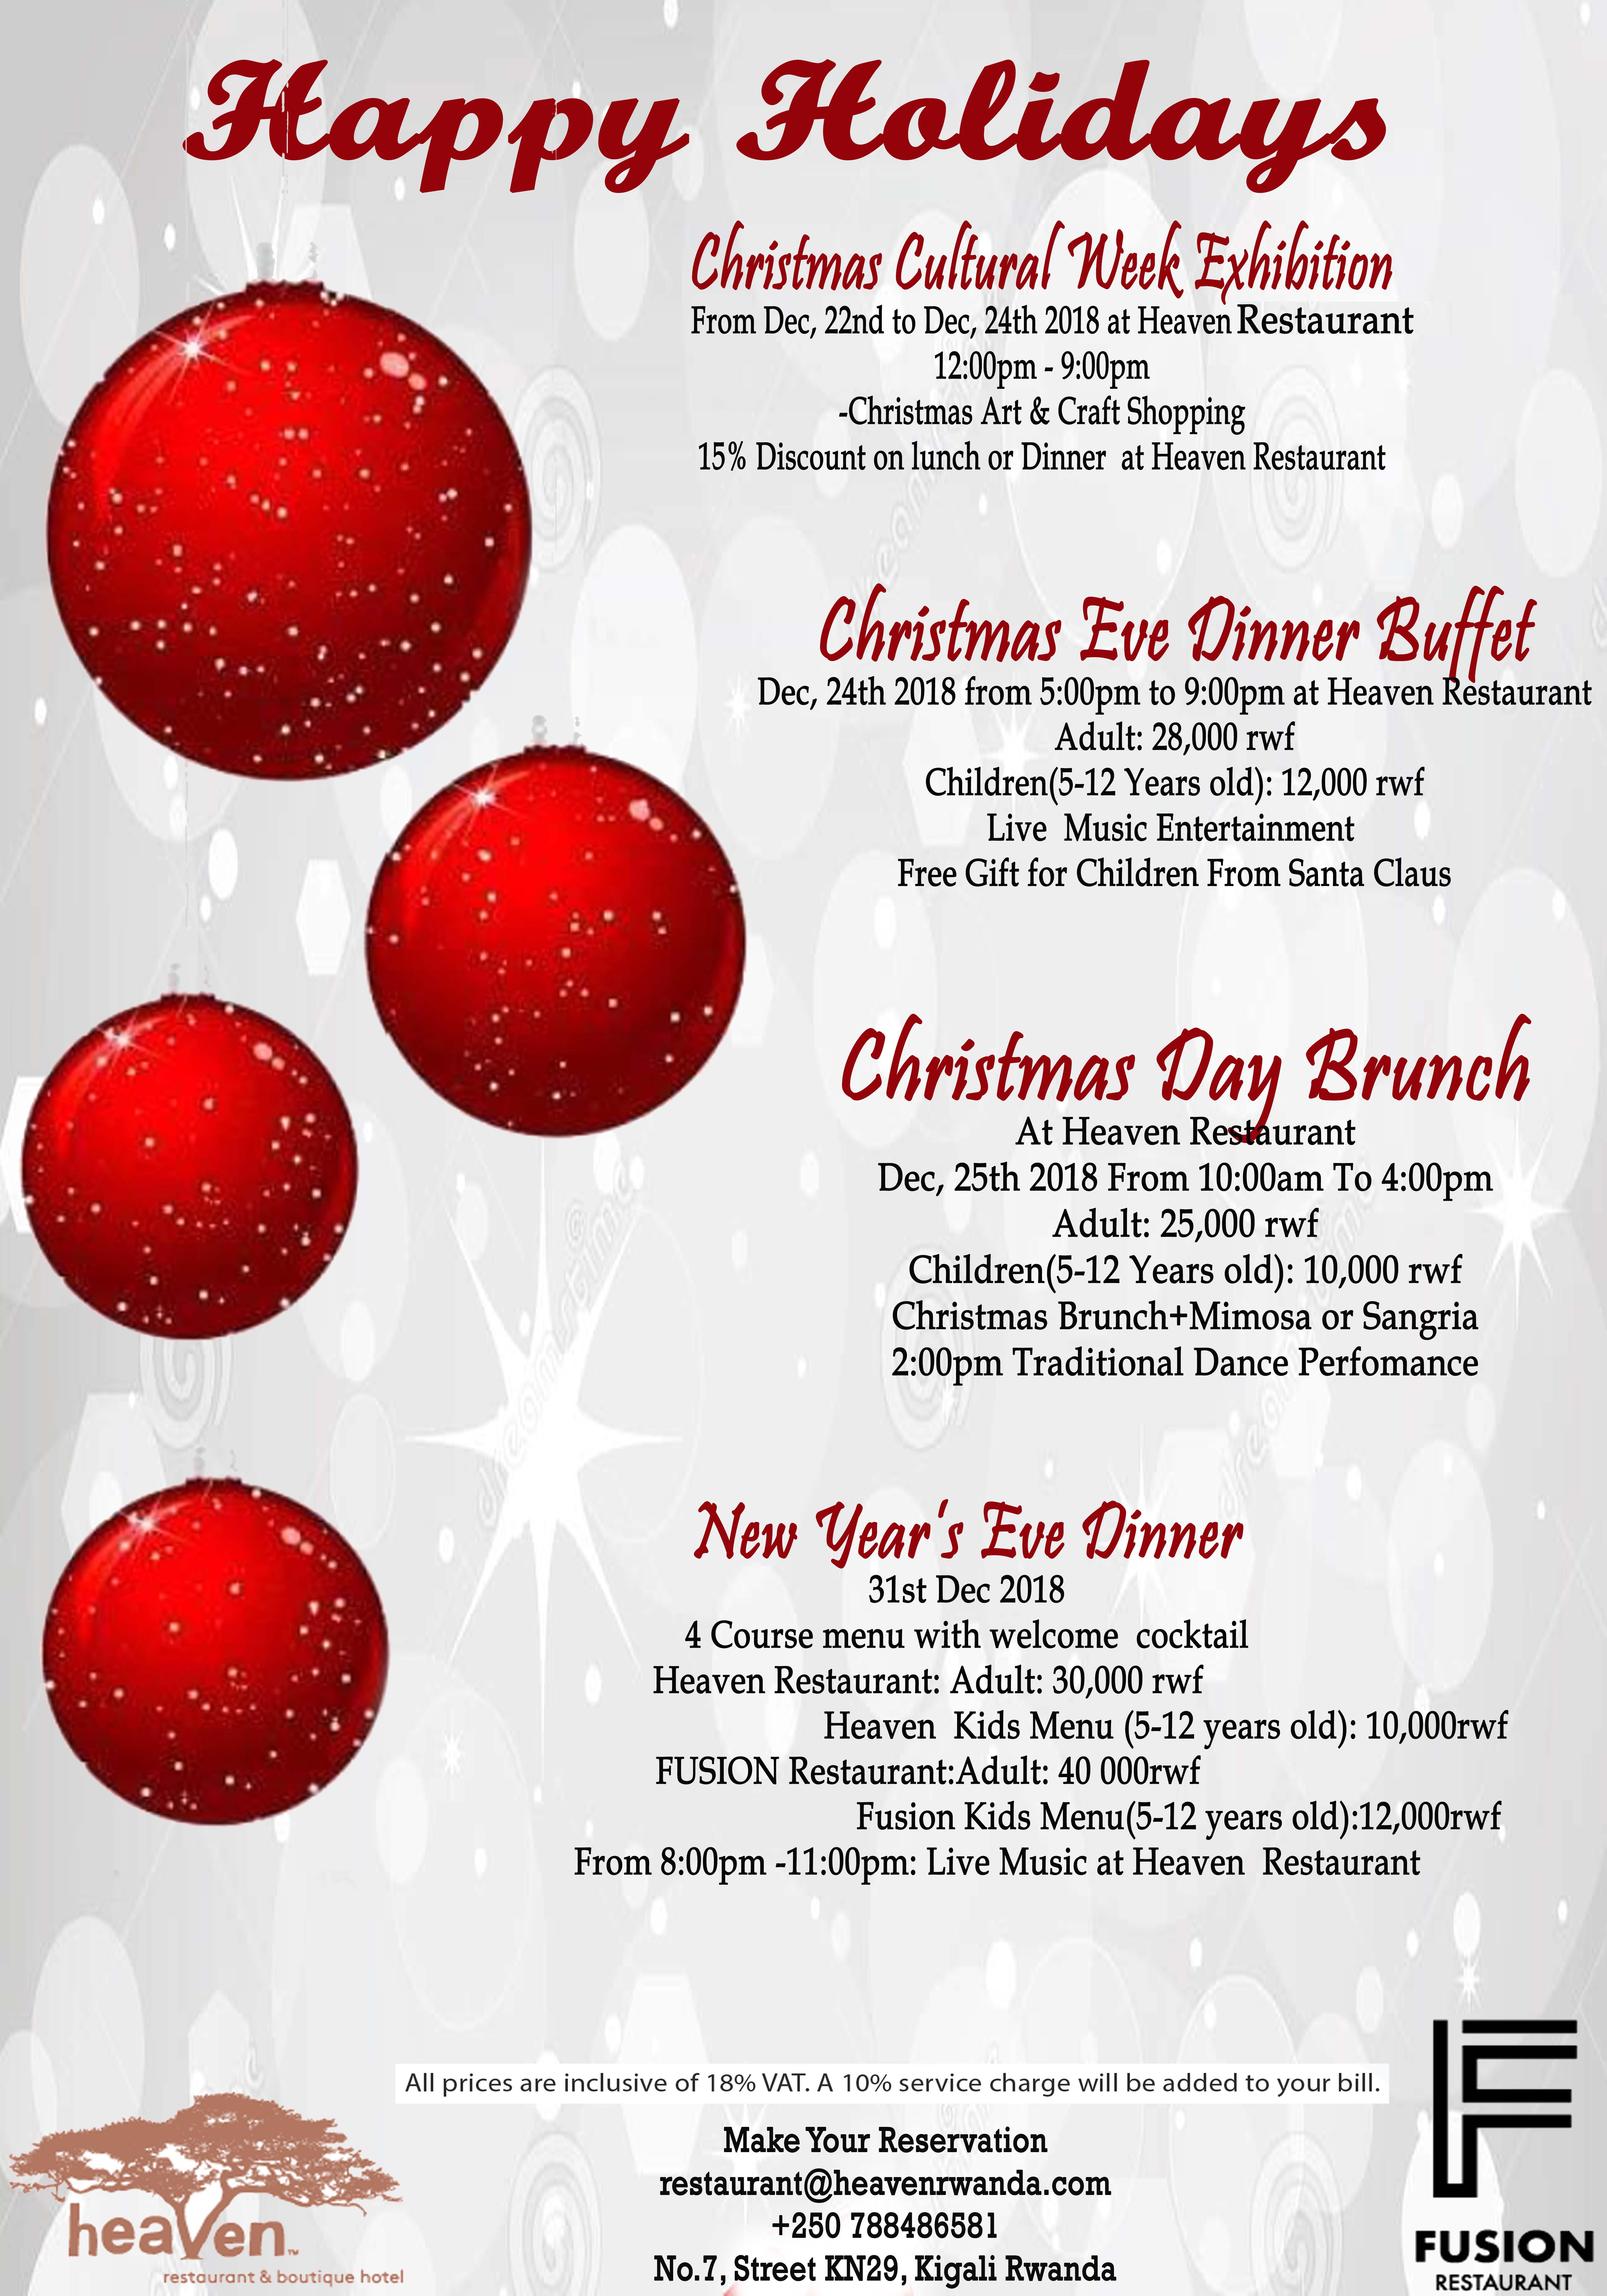 Christmas Eve Dinner Menu.Christmas Eve Dinner Buffet